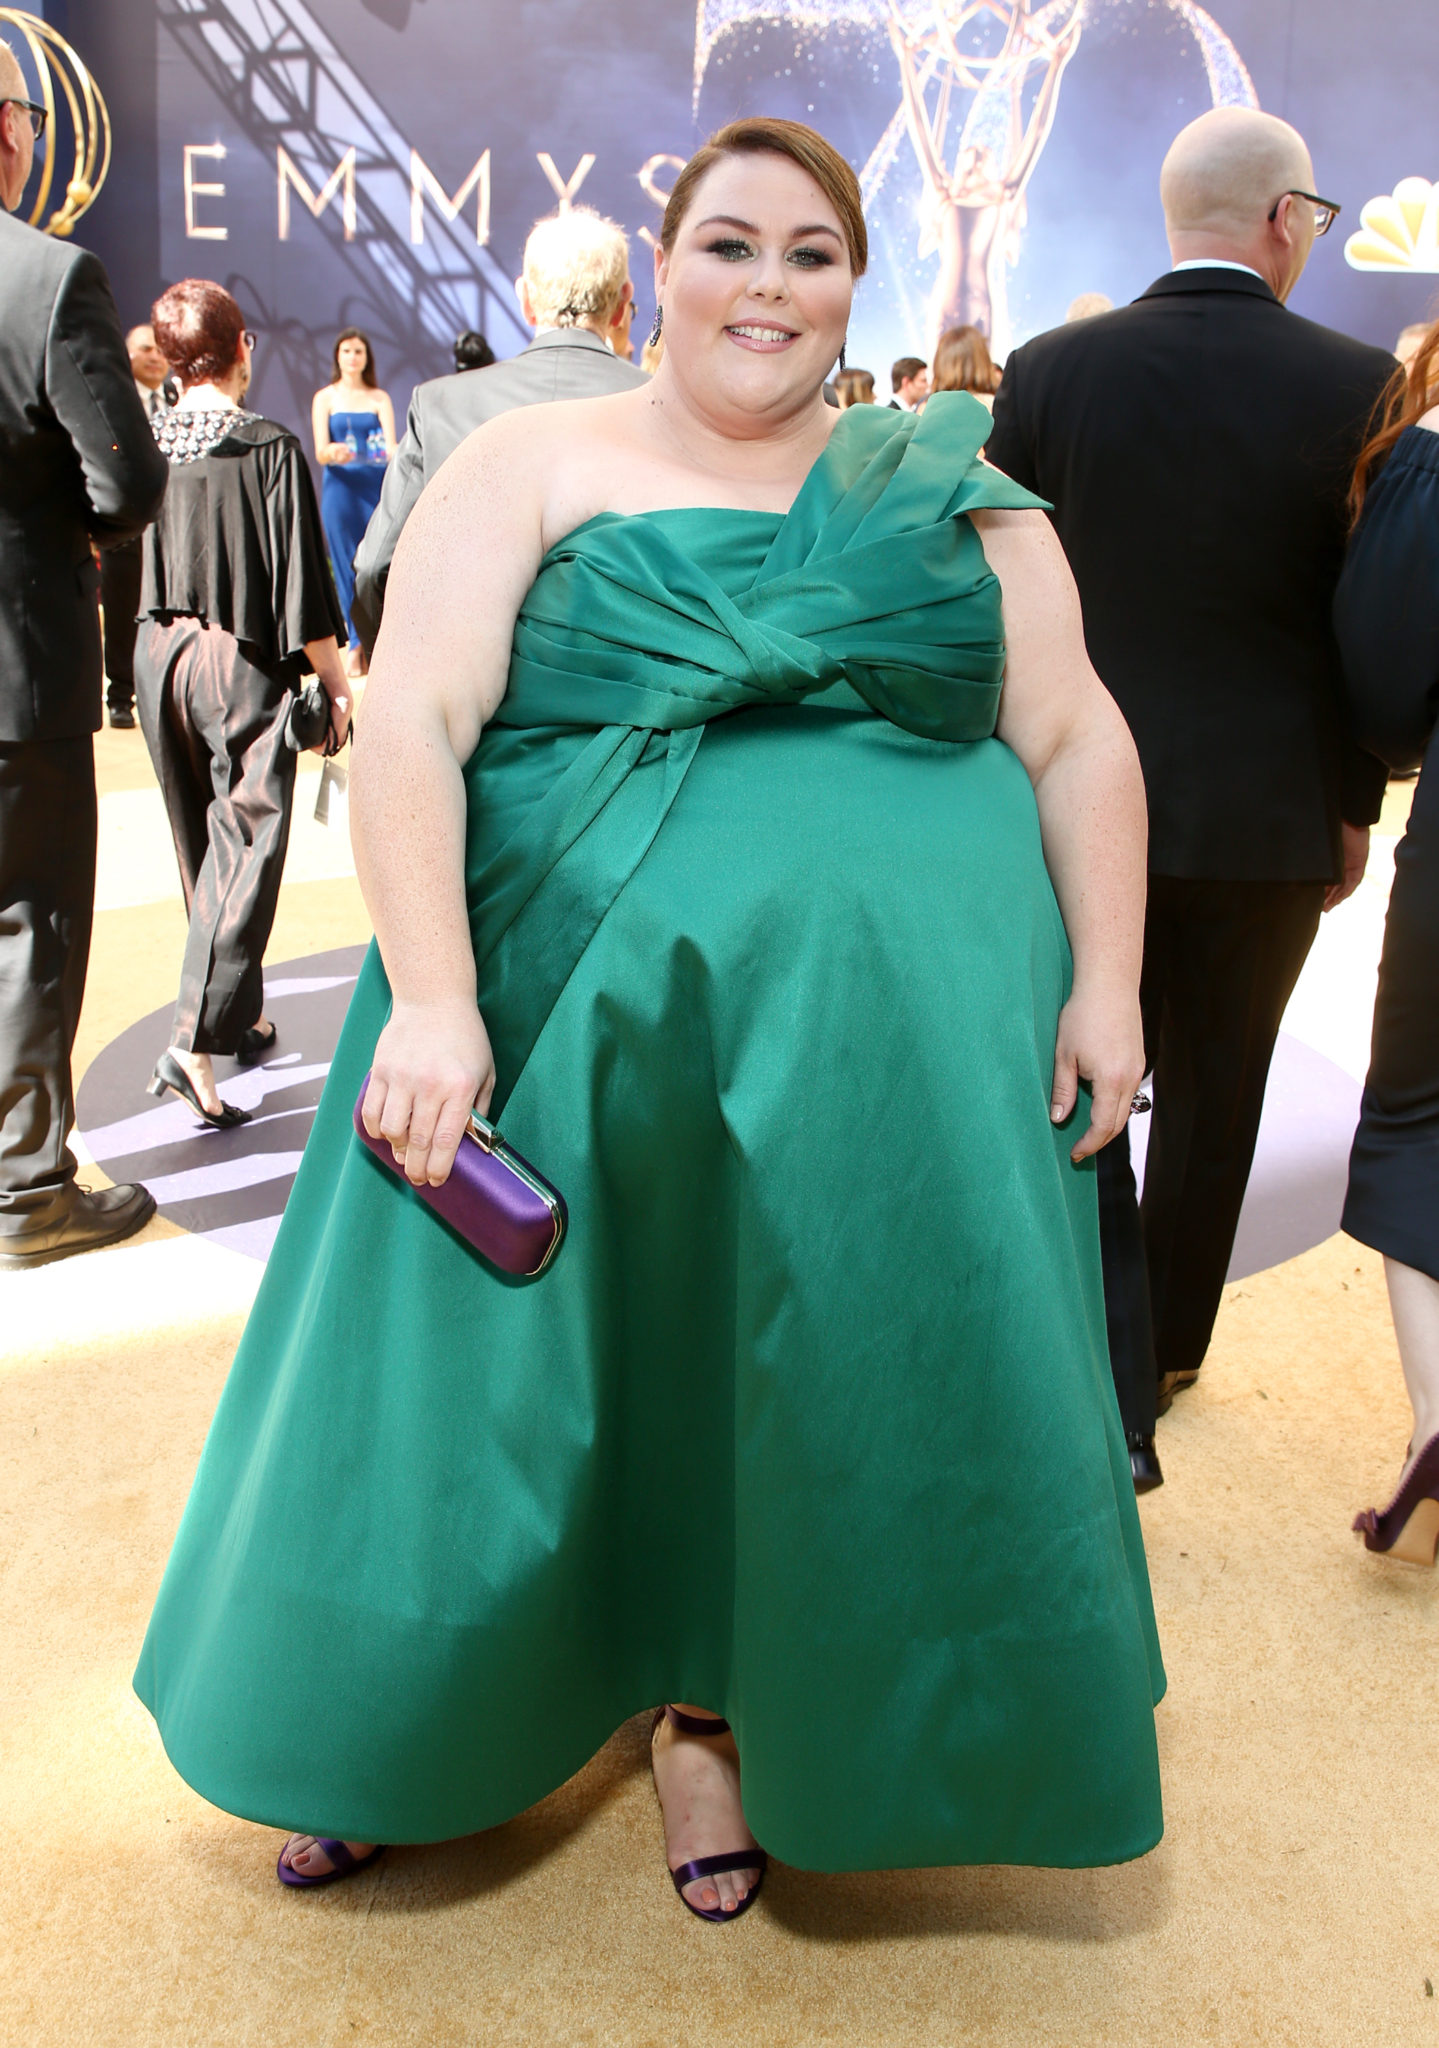 Chrissy Metz Emmys 4Chion Lifestyle